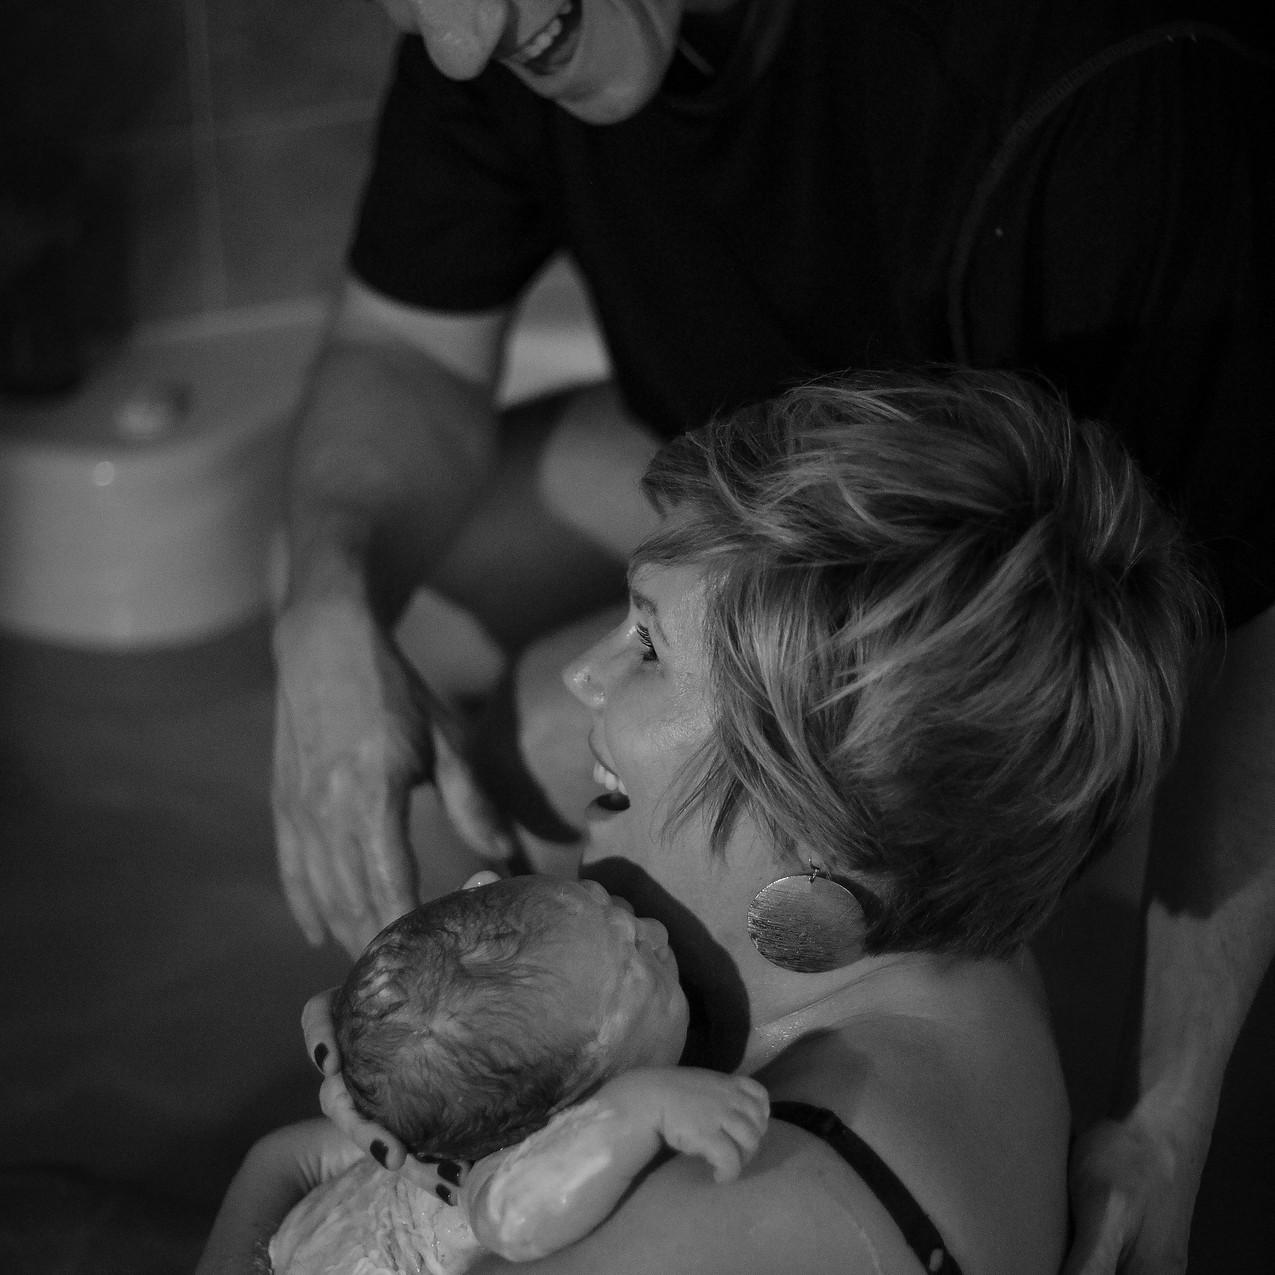 TampaBirthPhotographerLaborOfLoveBirthCenterLaborofLovebirthcenterTampaTampa Birth Photographer Tampa newborn Photographer in water birth Labor of love Lutz Fl_Jan252017_0130 copy